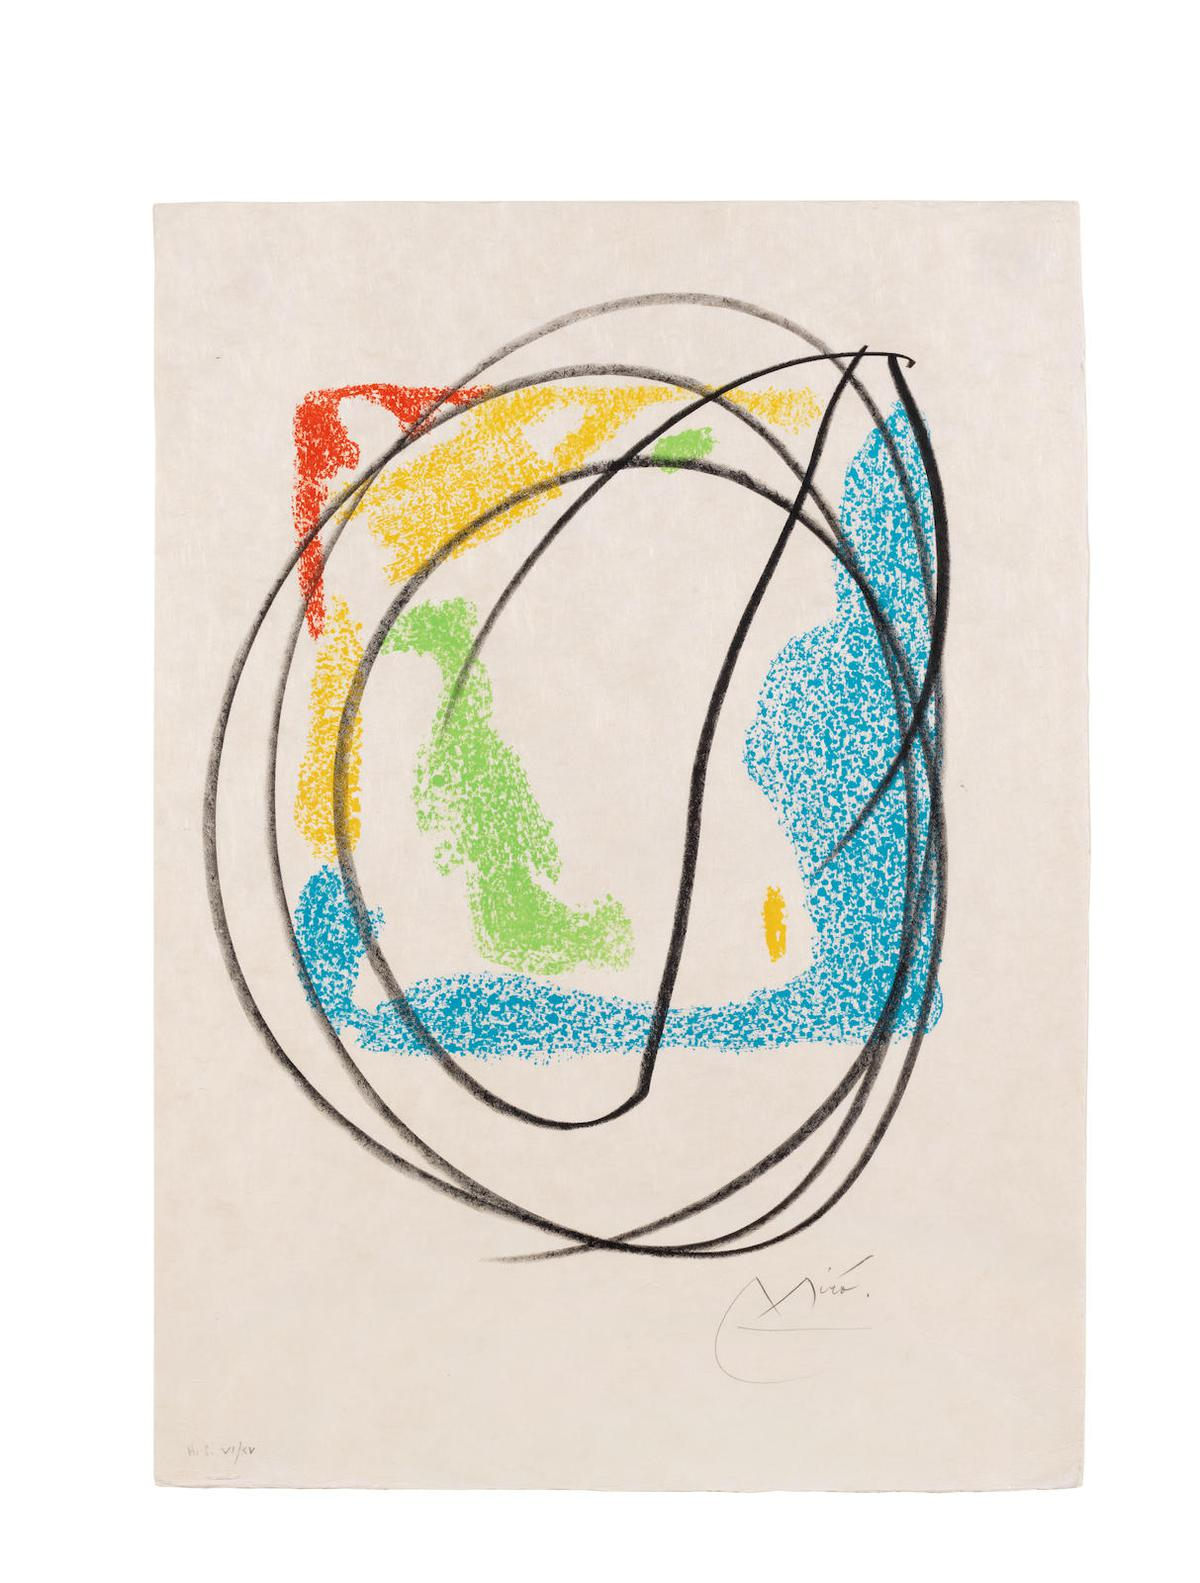 Joan Miro-One Plate, From Les Essencies De La Terra (Mourlot 580;Cramer Books 123)-1968